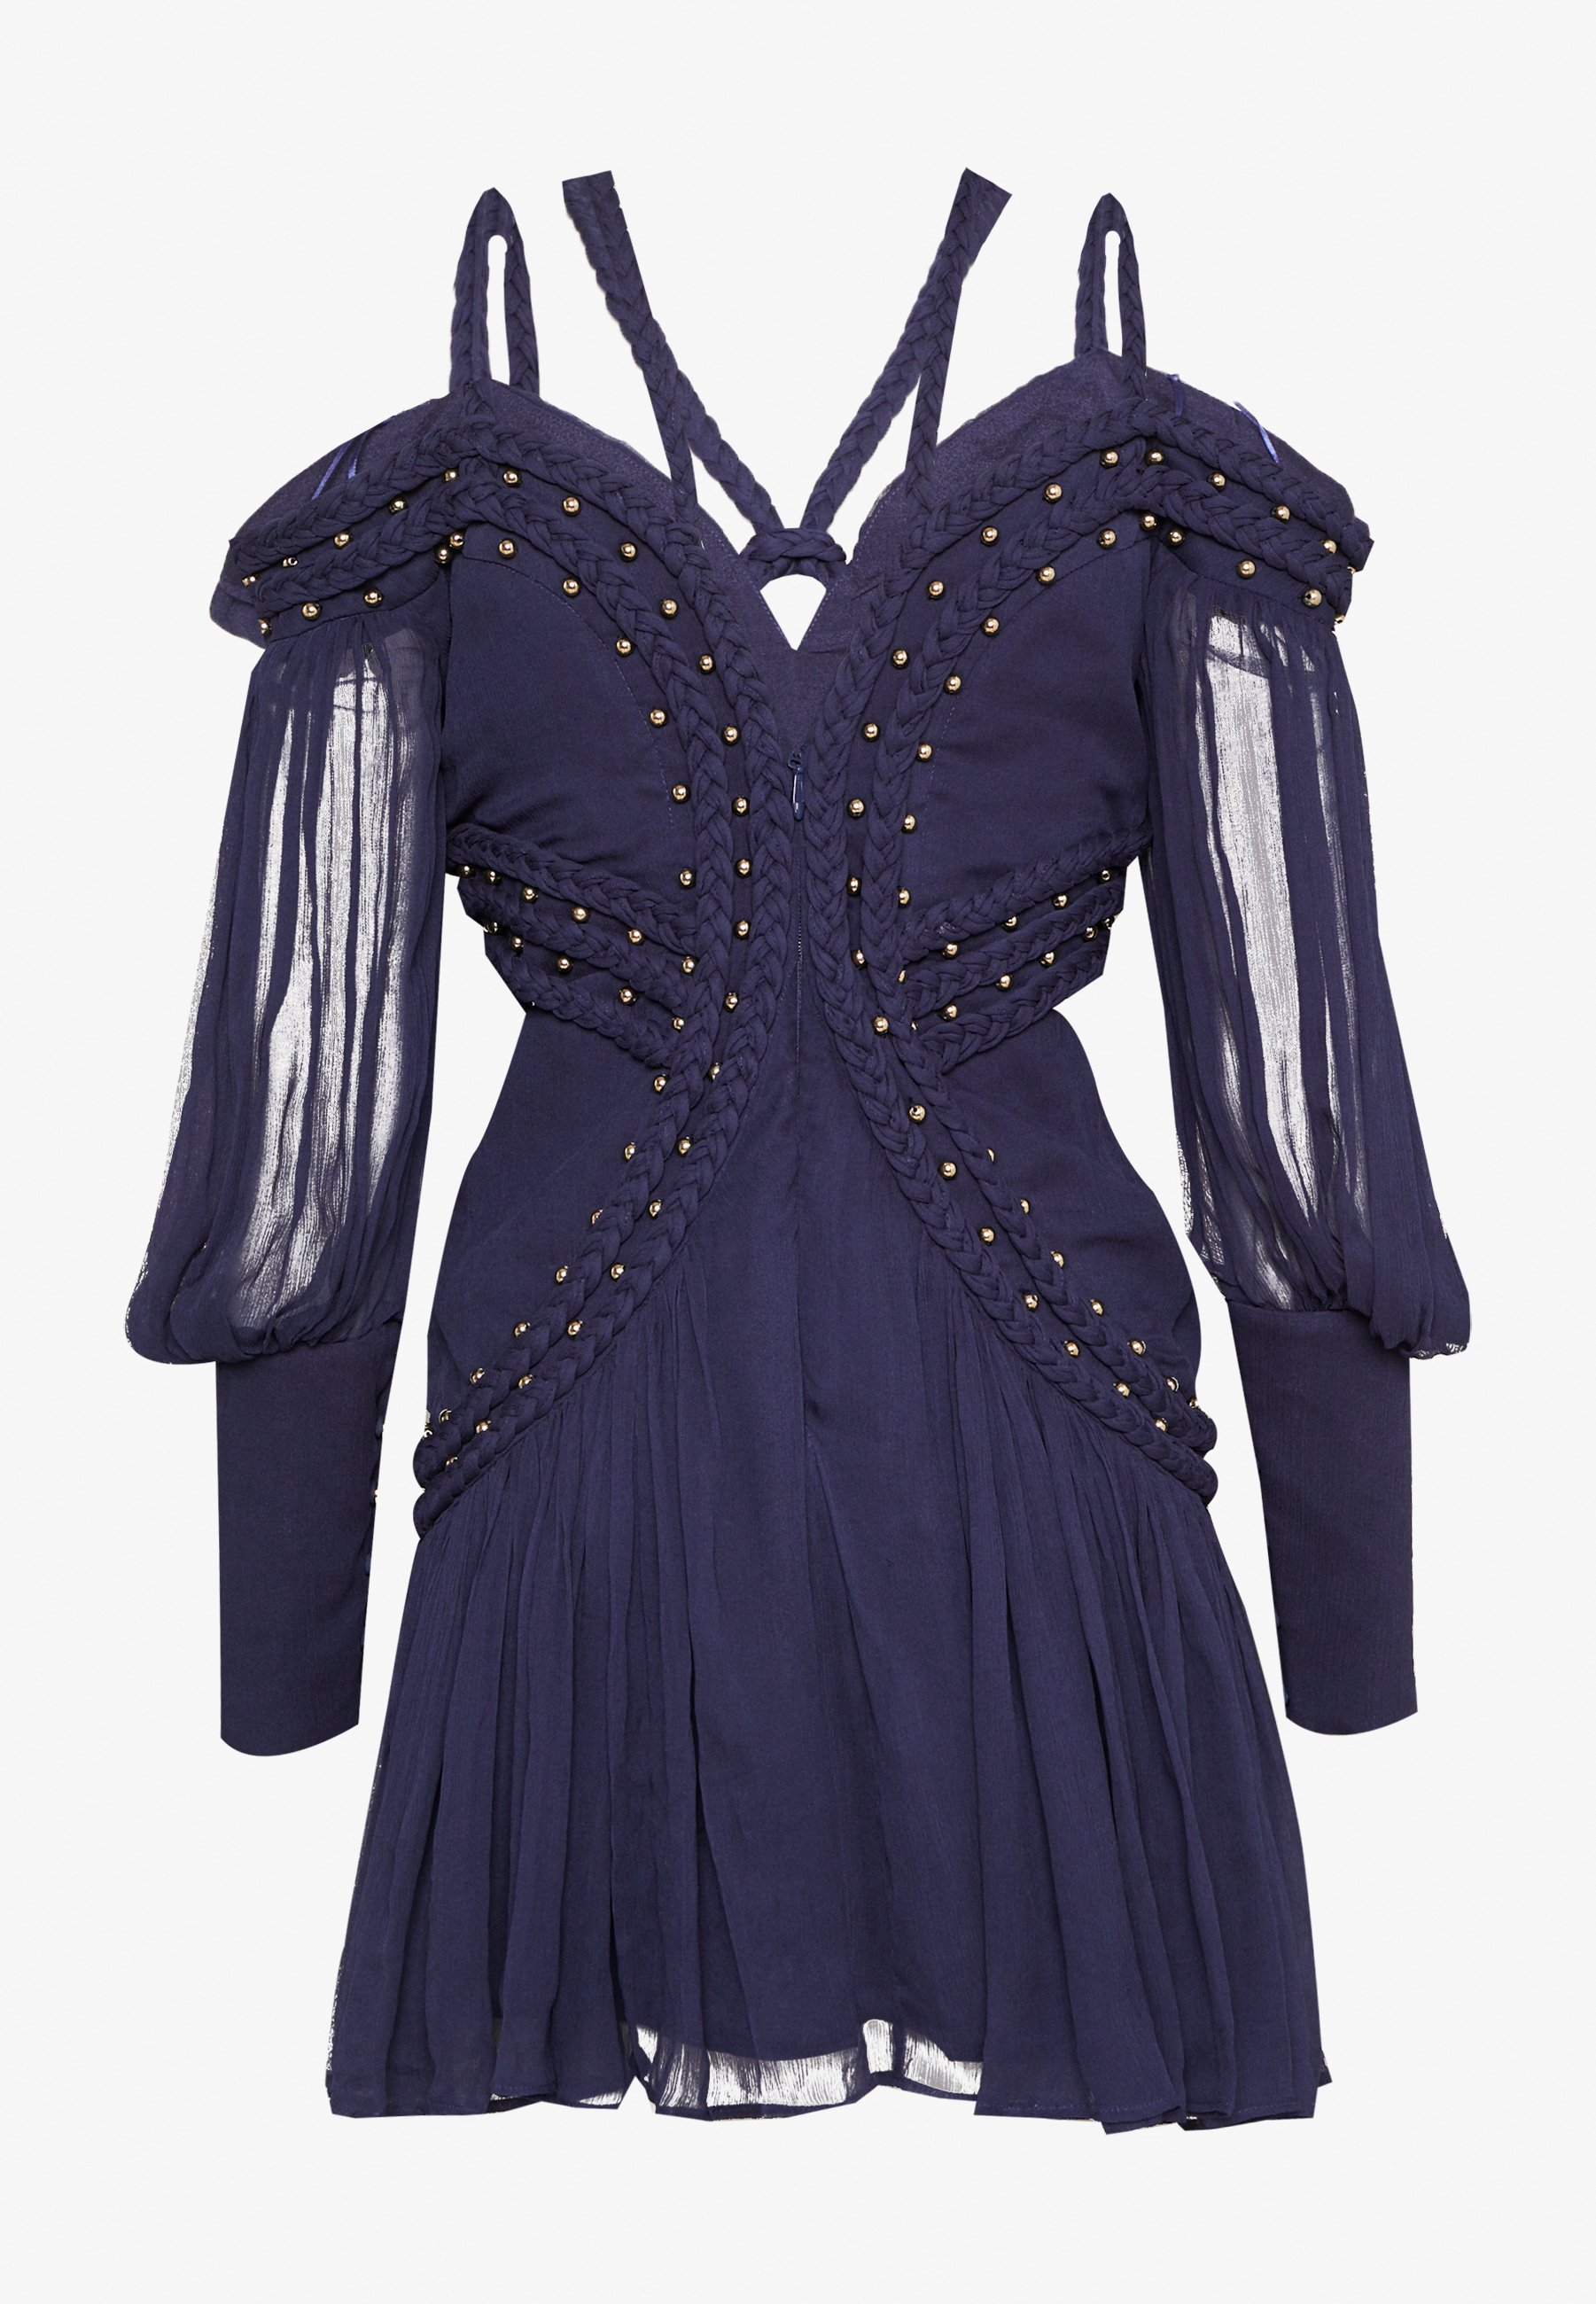 Thurley Moon River Mini Dress - Vardagsklänning Black Iris 2yhmARK